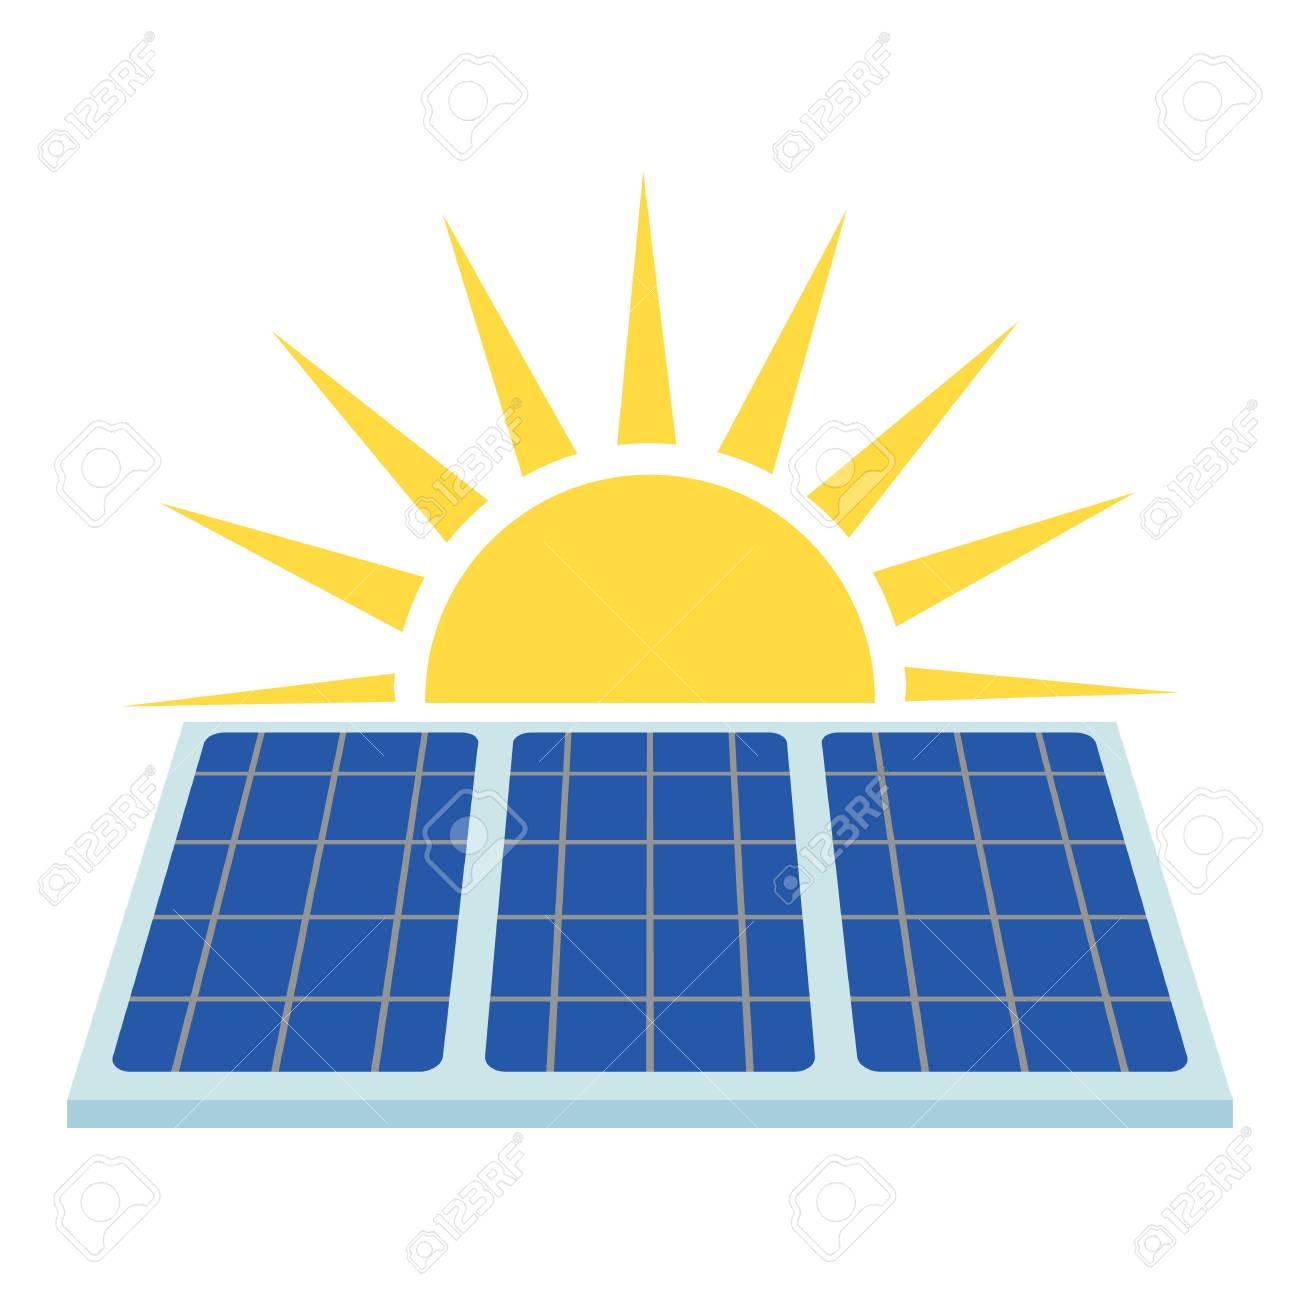 Solar panel icon  Flat illustration of solar panel vector icon